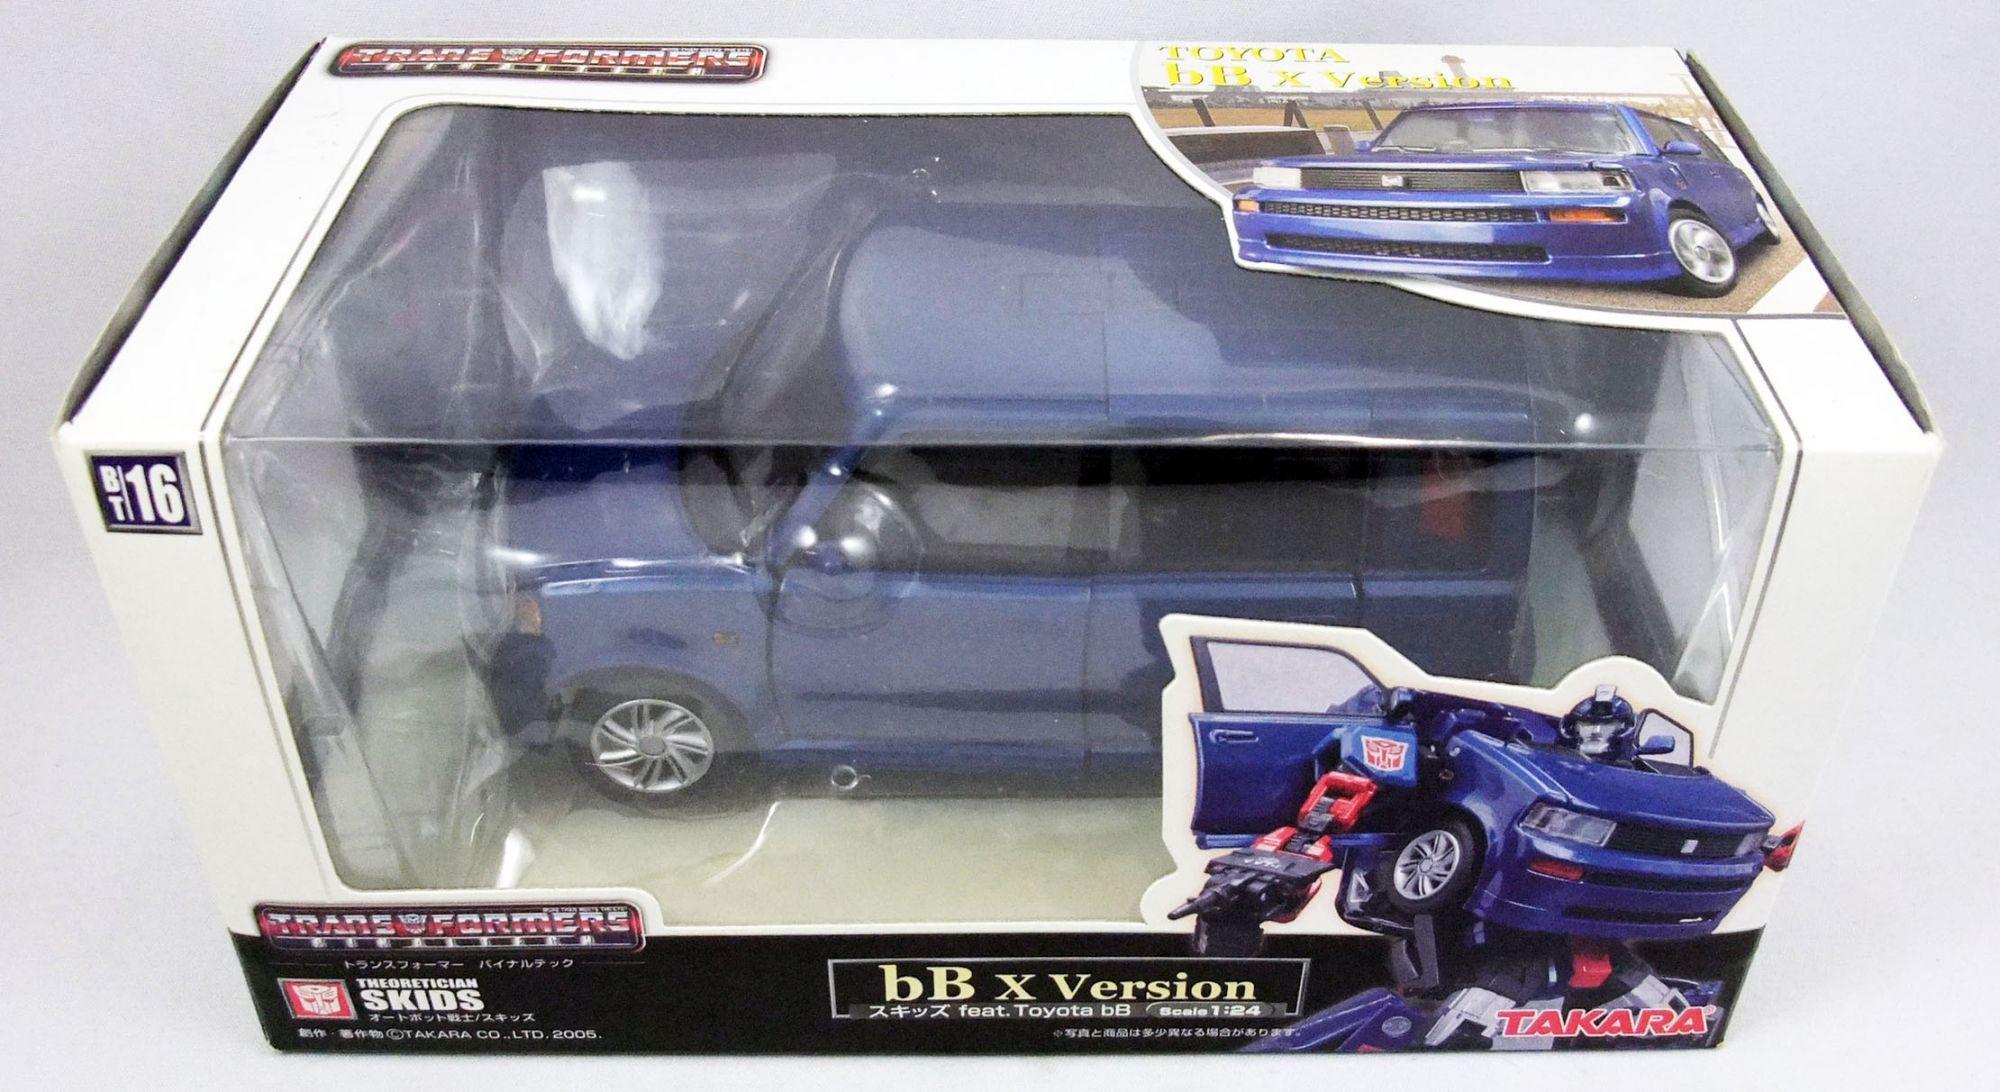 Transformers Binaltech - Takara - Skids (Toyota bB x Version)